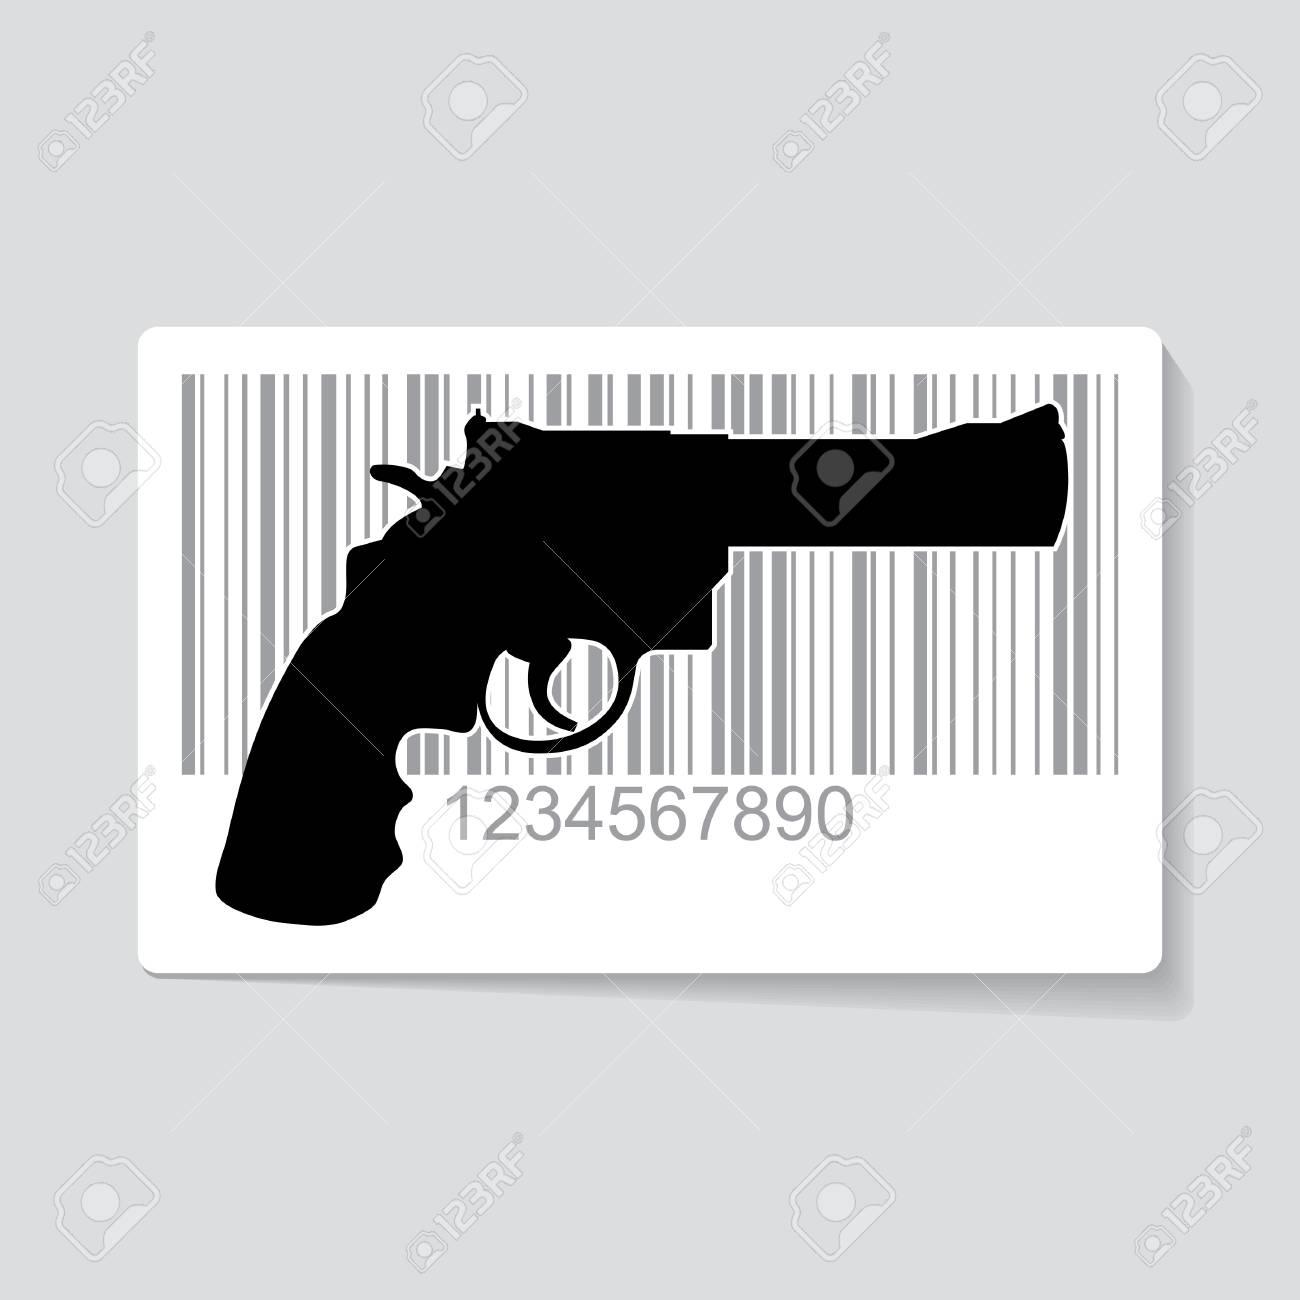 Gun as barcode symbol - illustration Stock Vector - 17181493